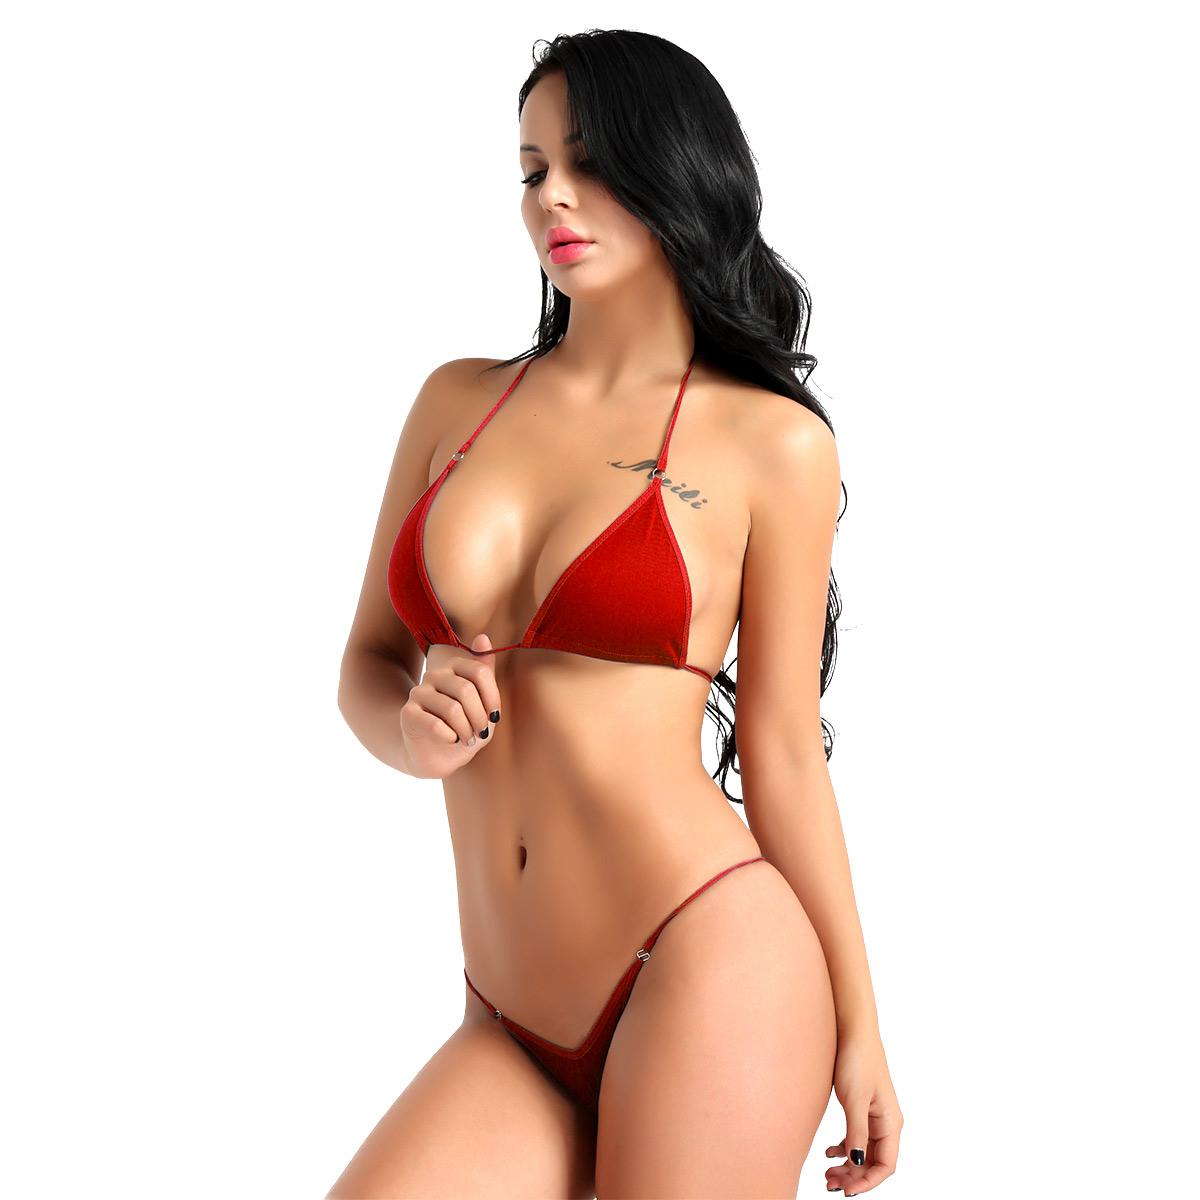 Women Intimates Lingerie Bra Set Solid Color Halterneck Mini Micro Bikini Bra Top with G-String Briefs Underwear Sleepwear